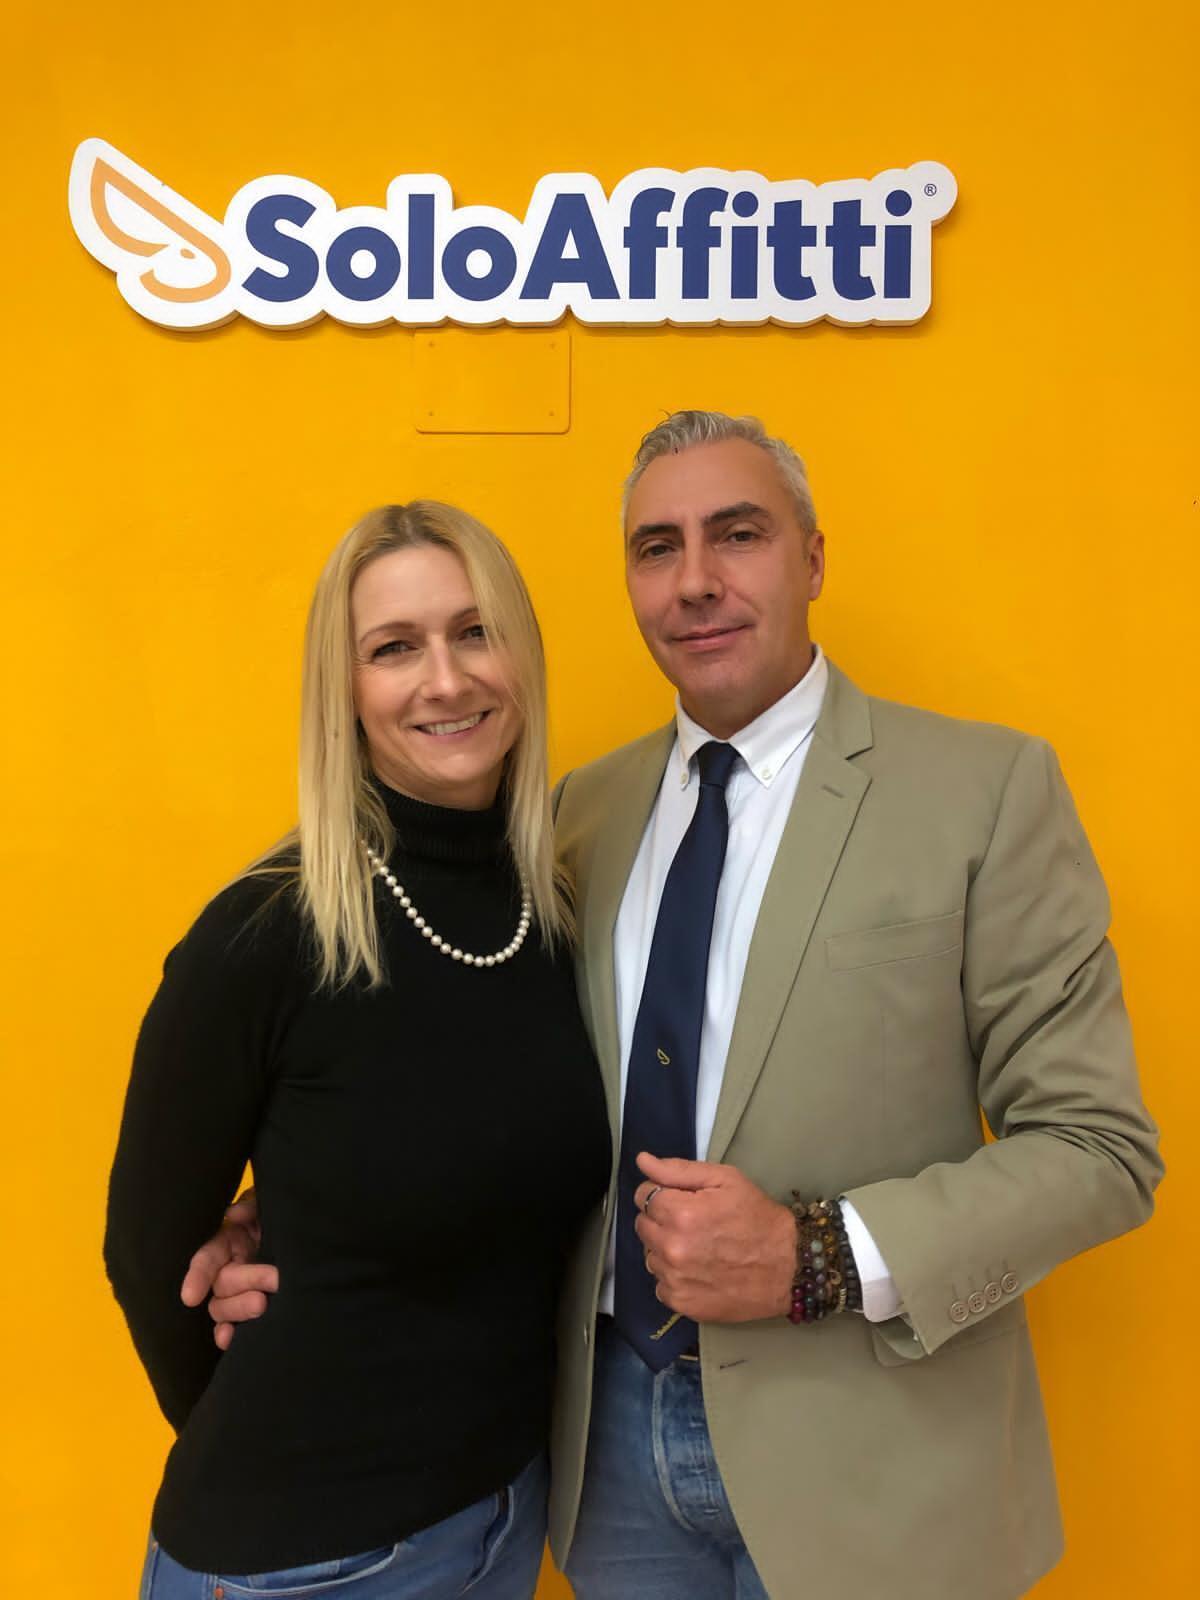 SoloAffitti Rodengo Saiano